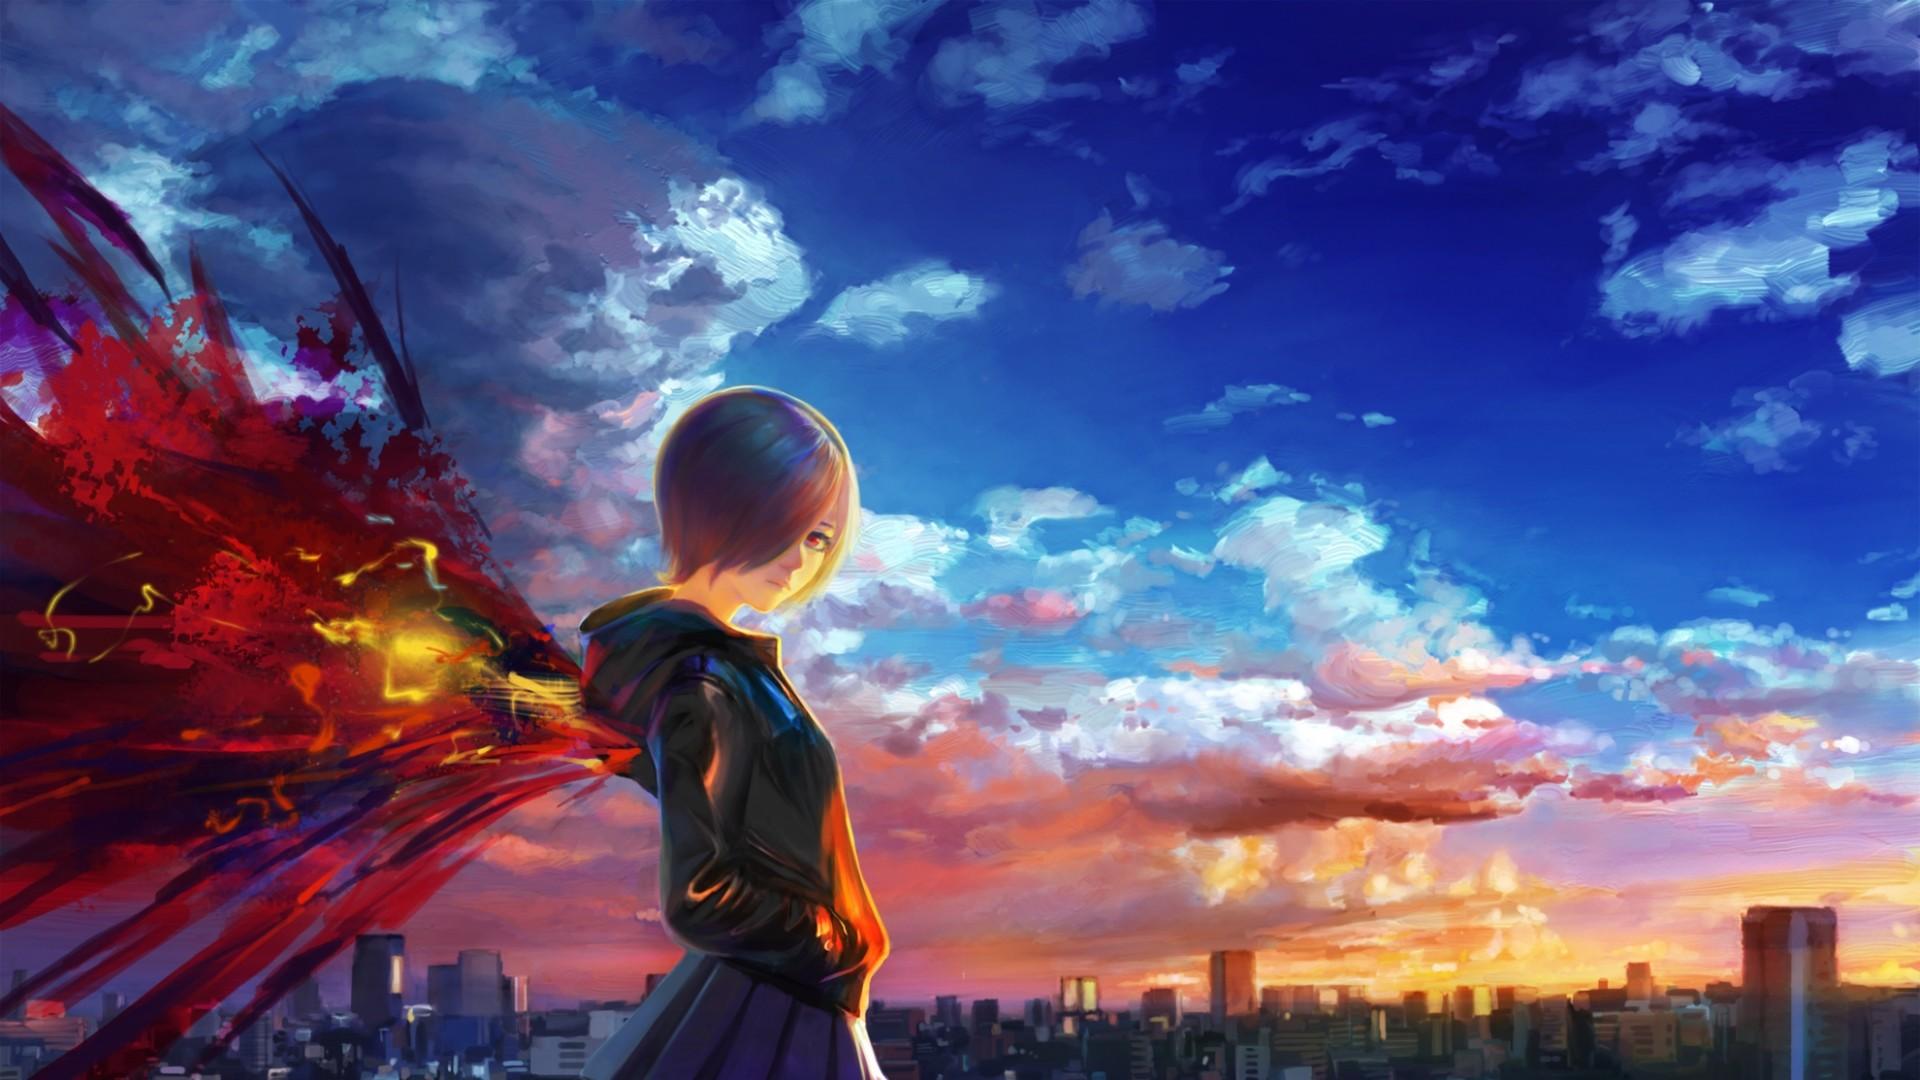 Wallpaper tokyo ghoul, kirishima touka, city, sky, wings